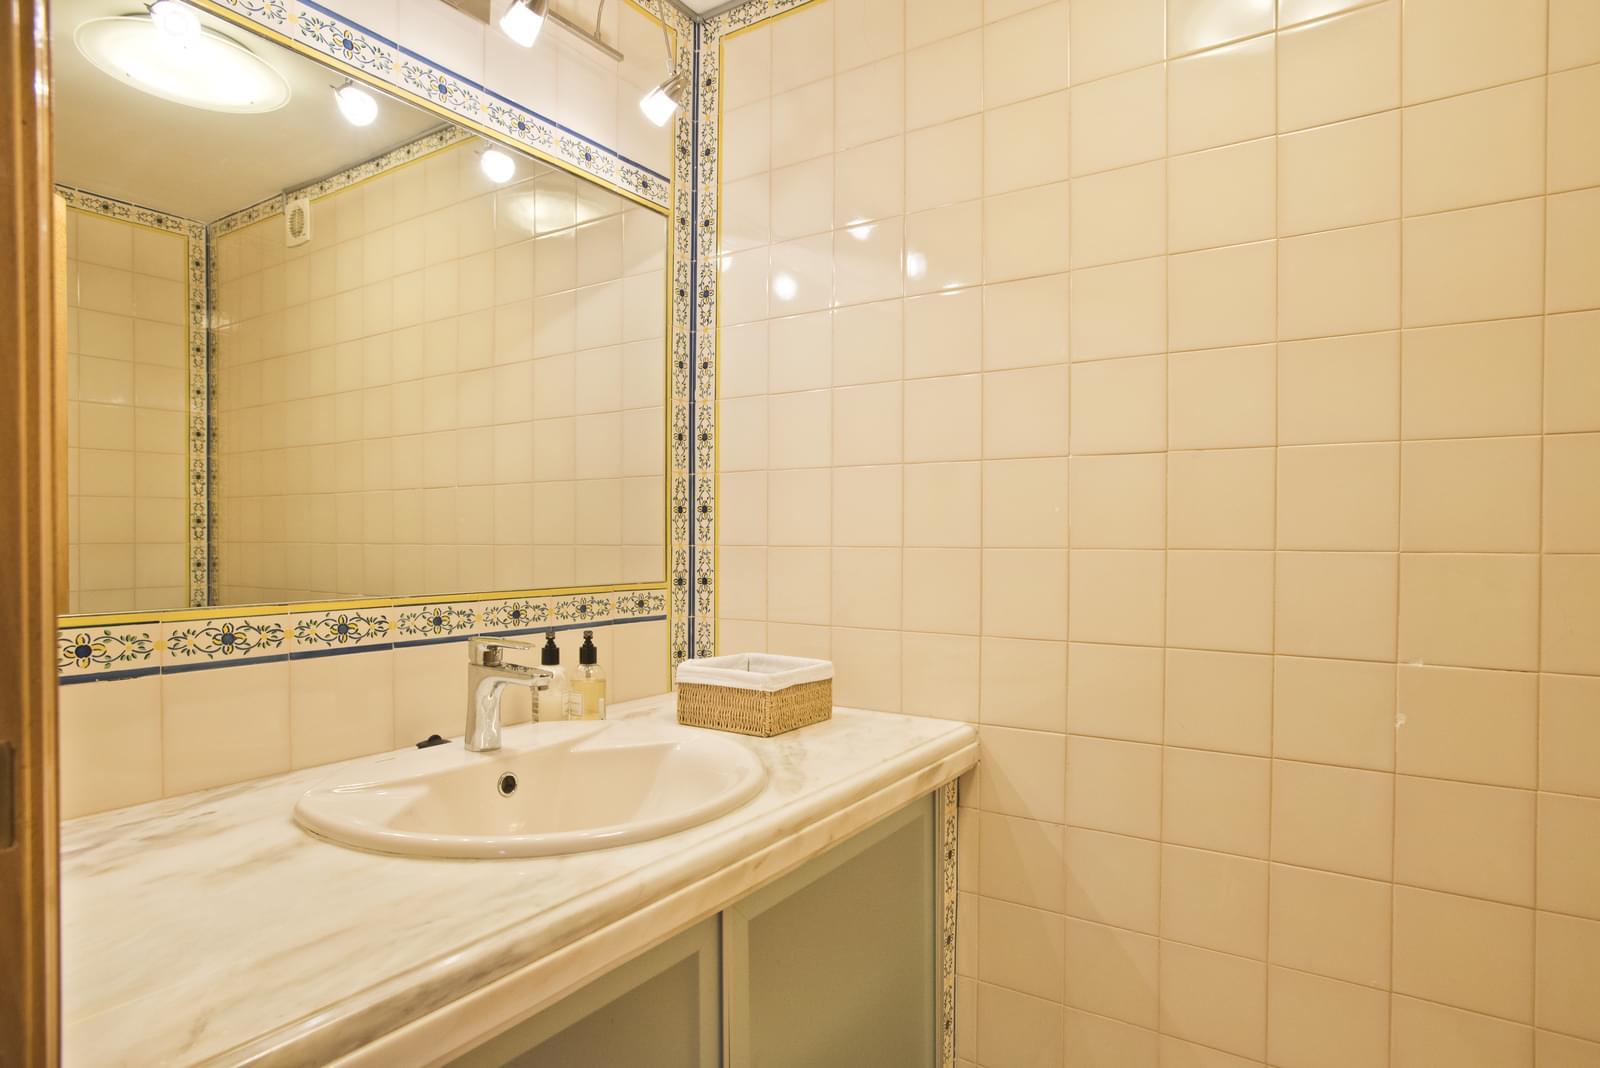 pf17156-apartamento-t3-cascais-d7b18375-ef4f-4b66-97bf-3dddb7058511